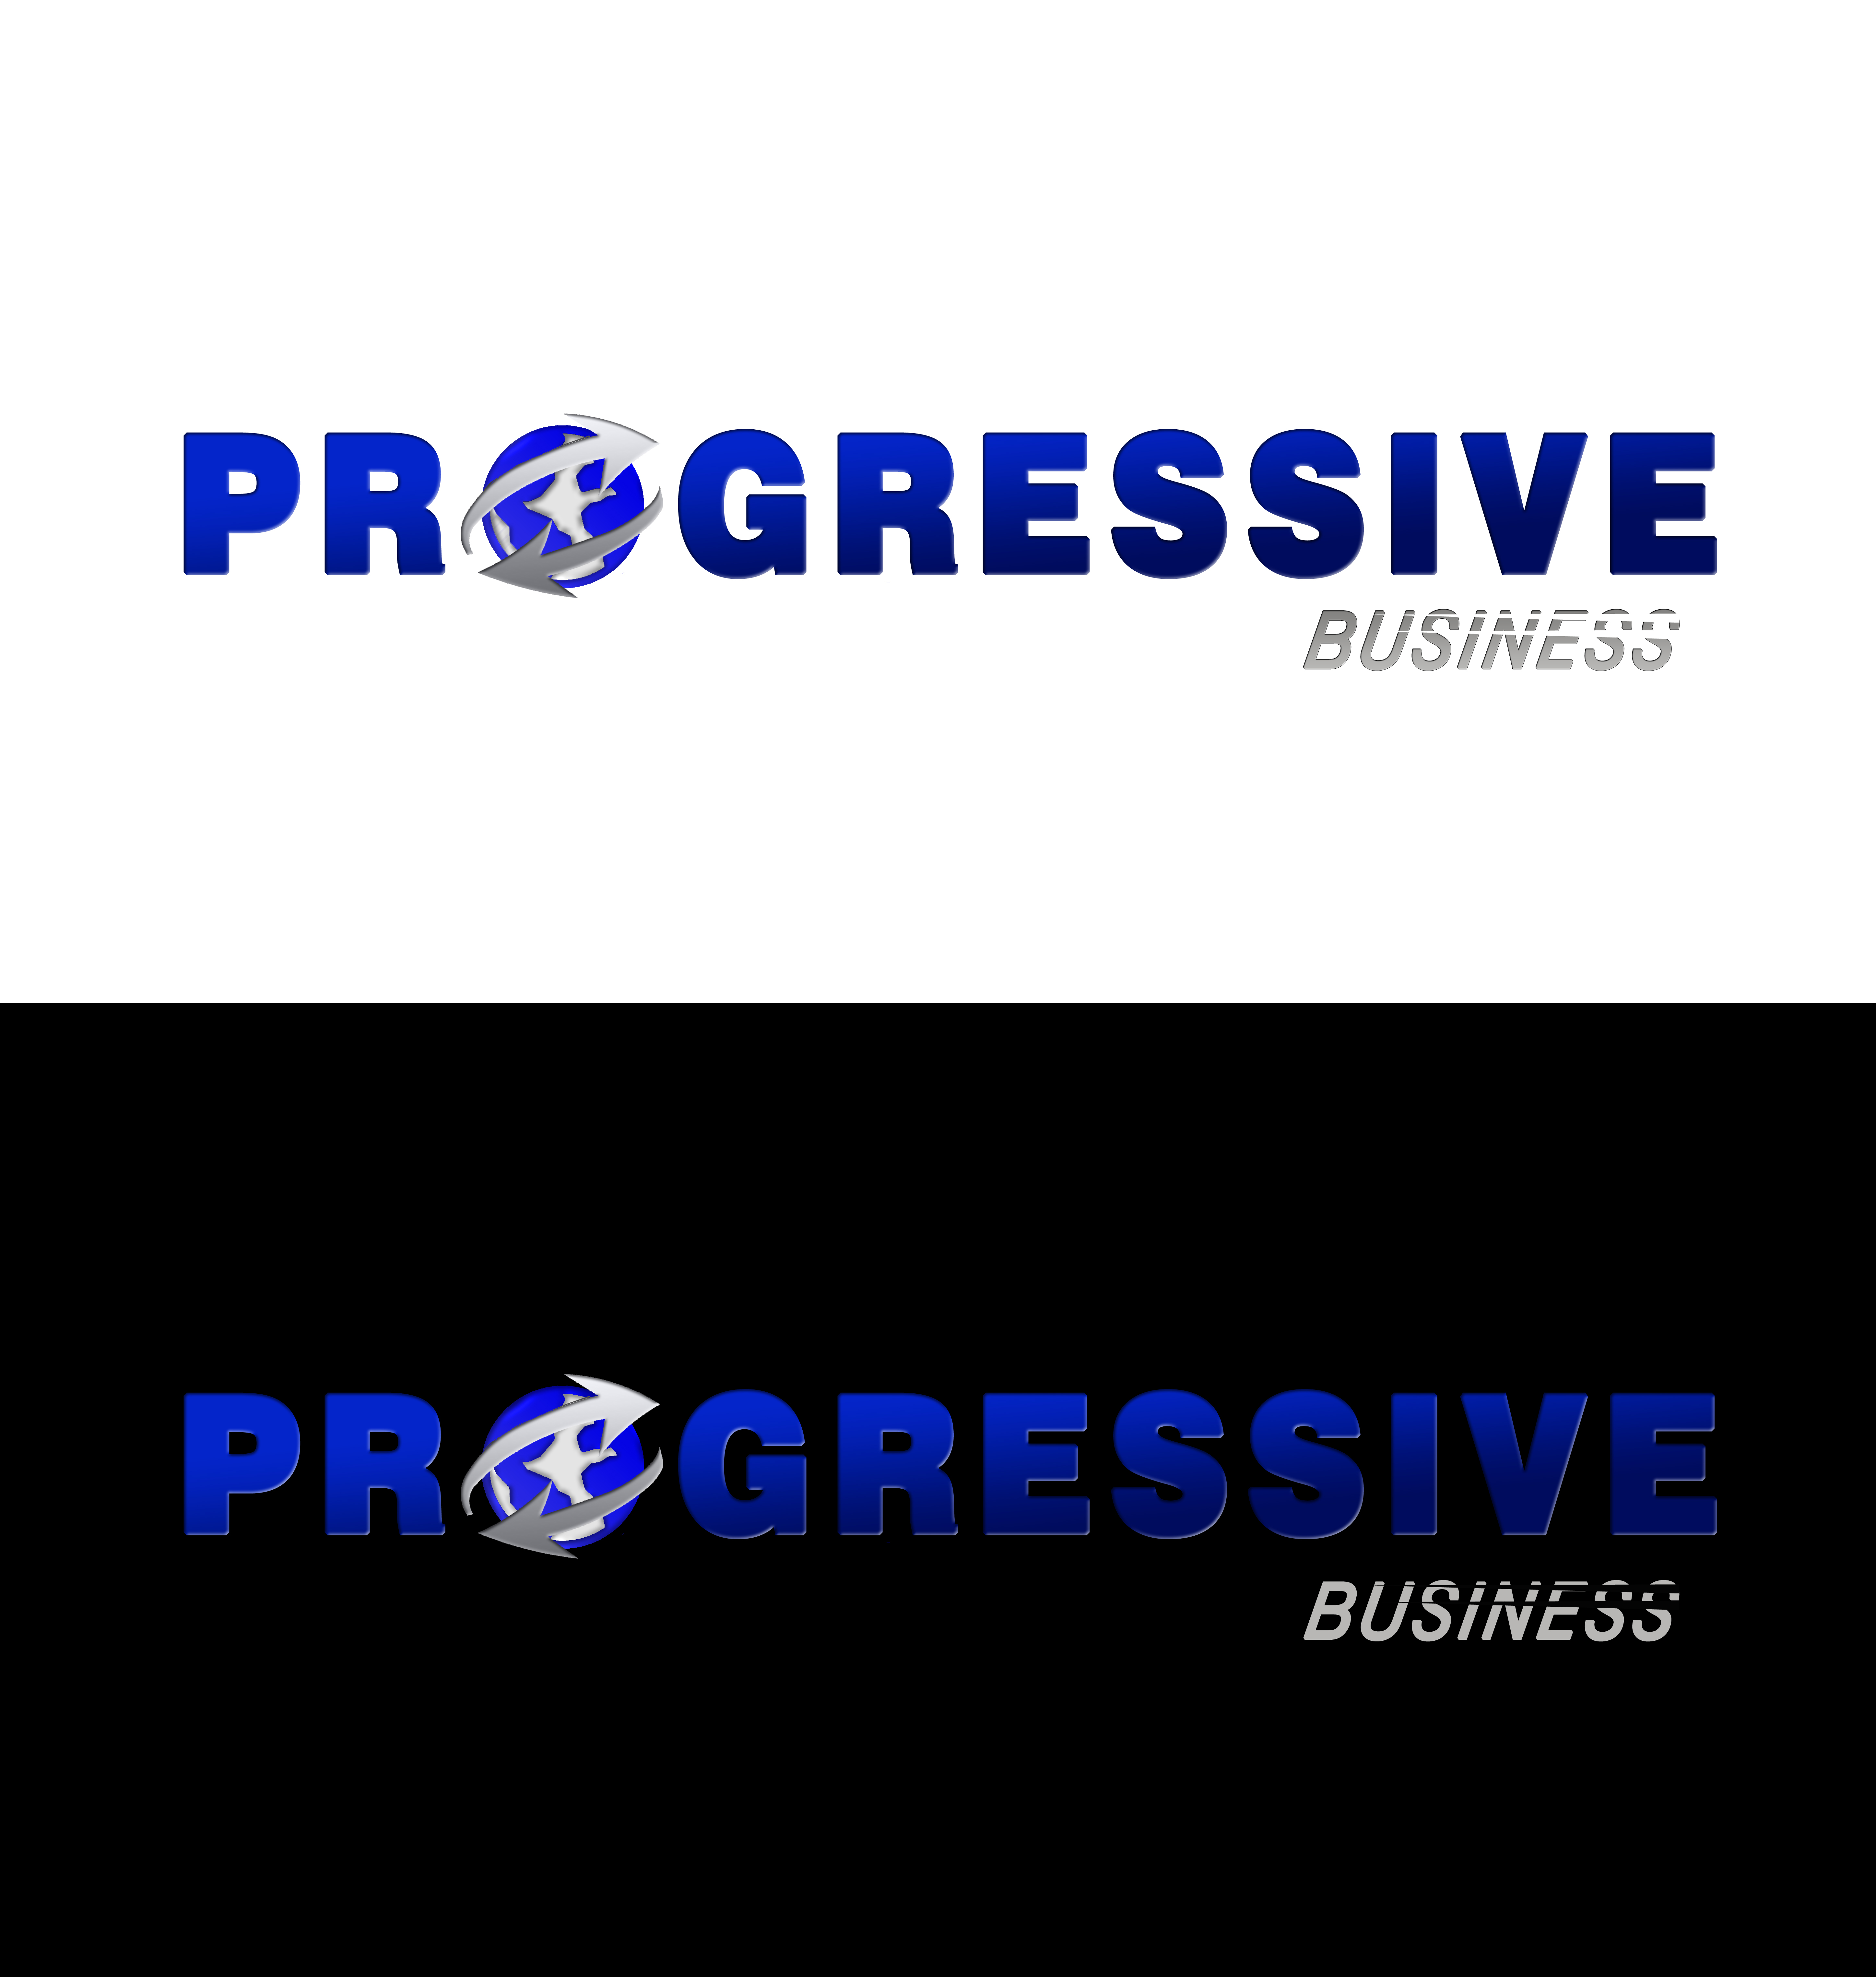 Logo Design by JSDESIGNGROUP - Entry No. 187 in the Logo Design Contest Captivating Logo Design for Progressive Business.